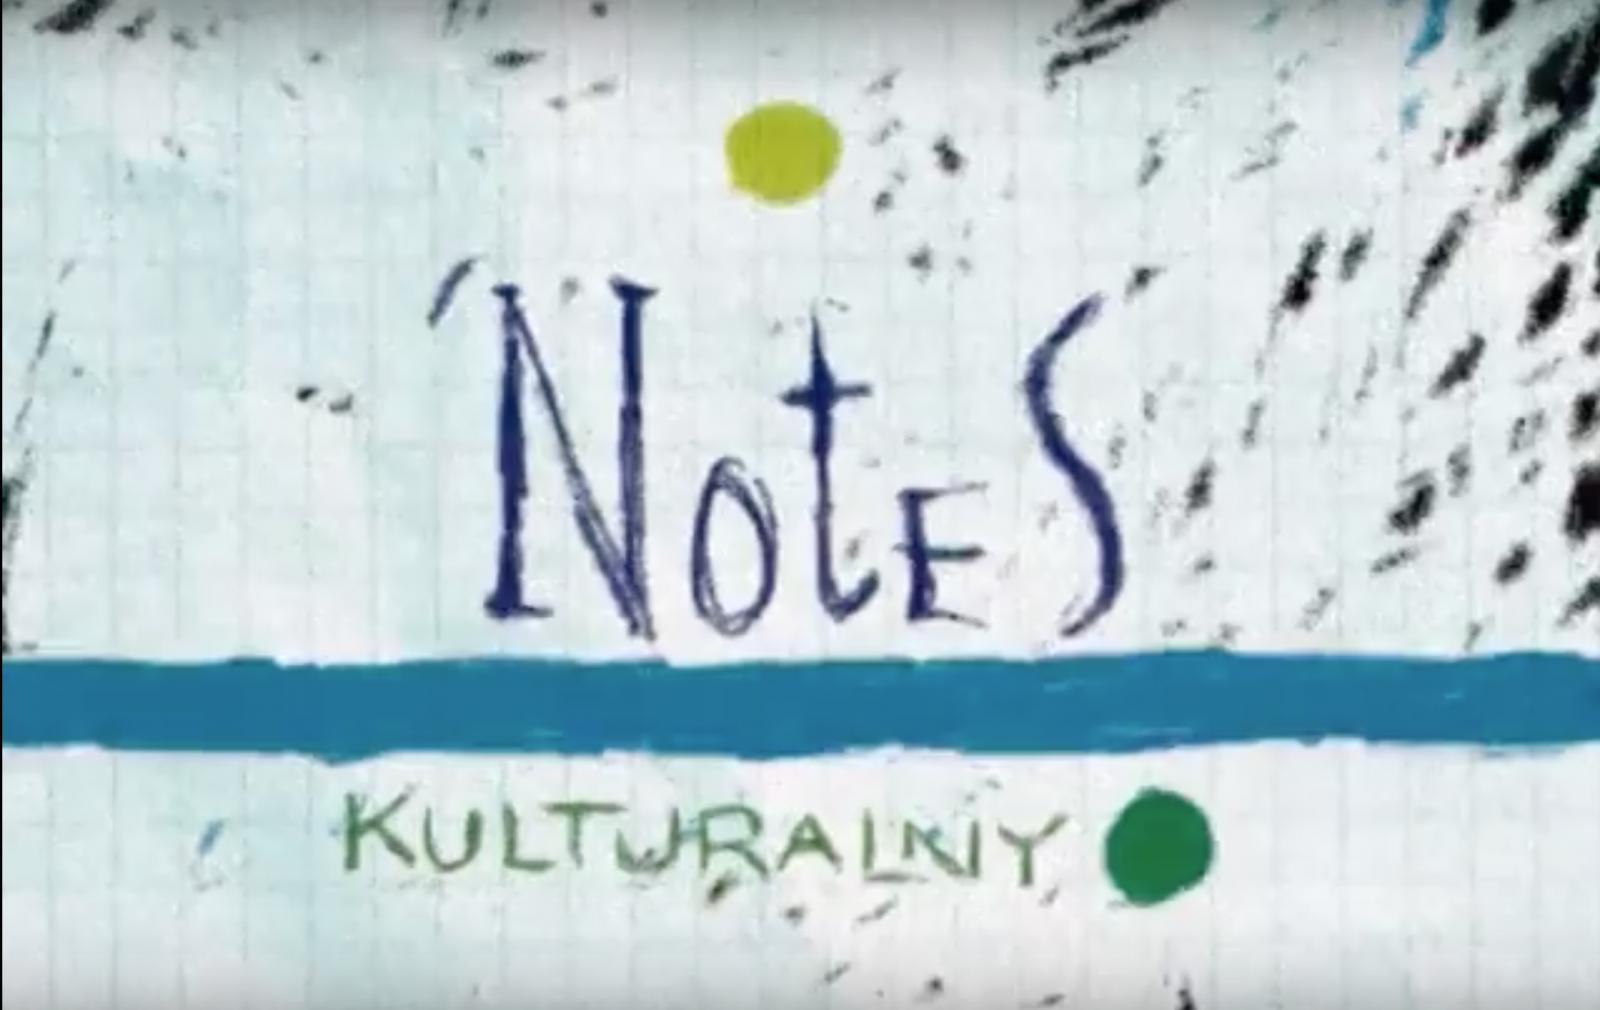 Steve Buchanan/Andrzej Prokopiuk/Steve Swell) - NOTES KLUTURALNY - odc. 1